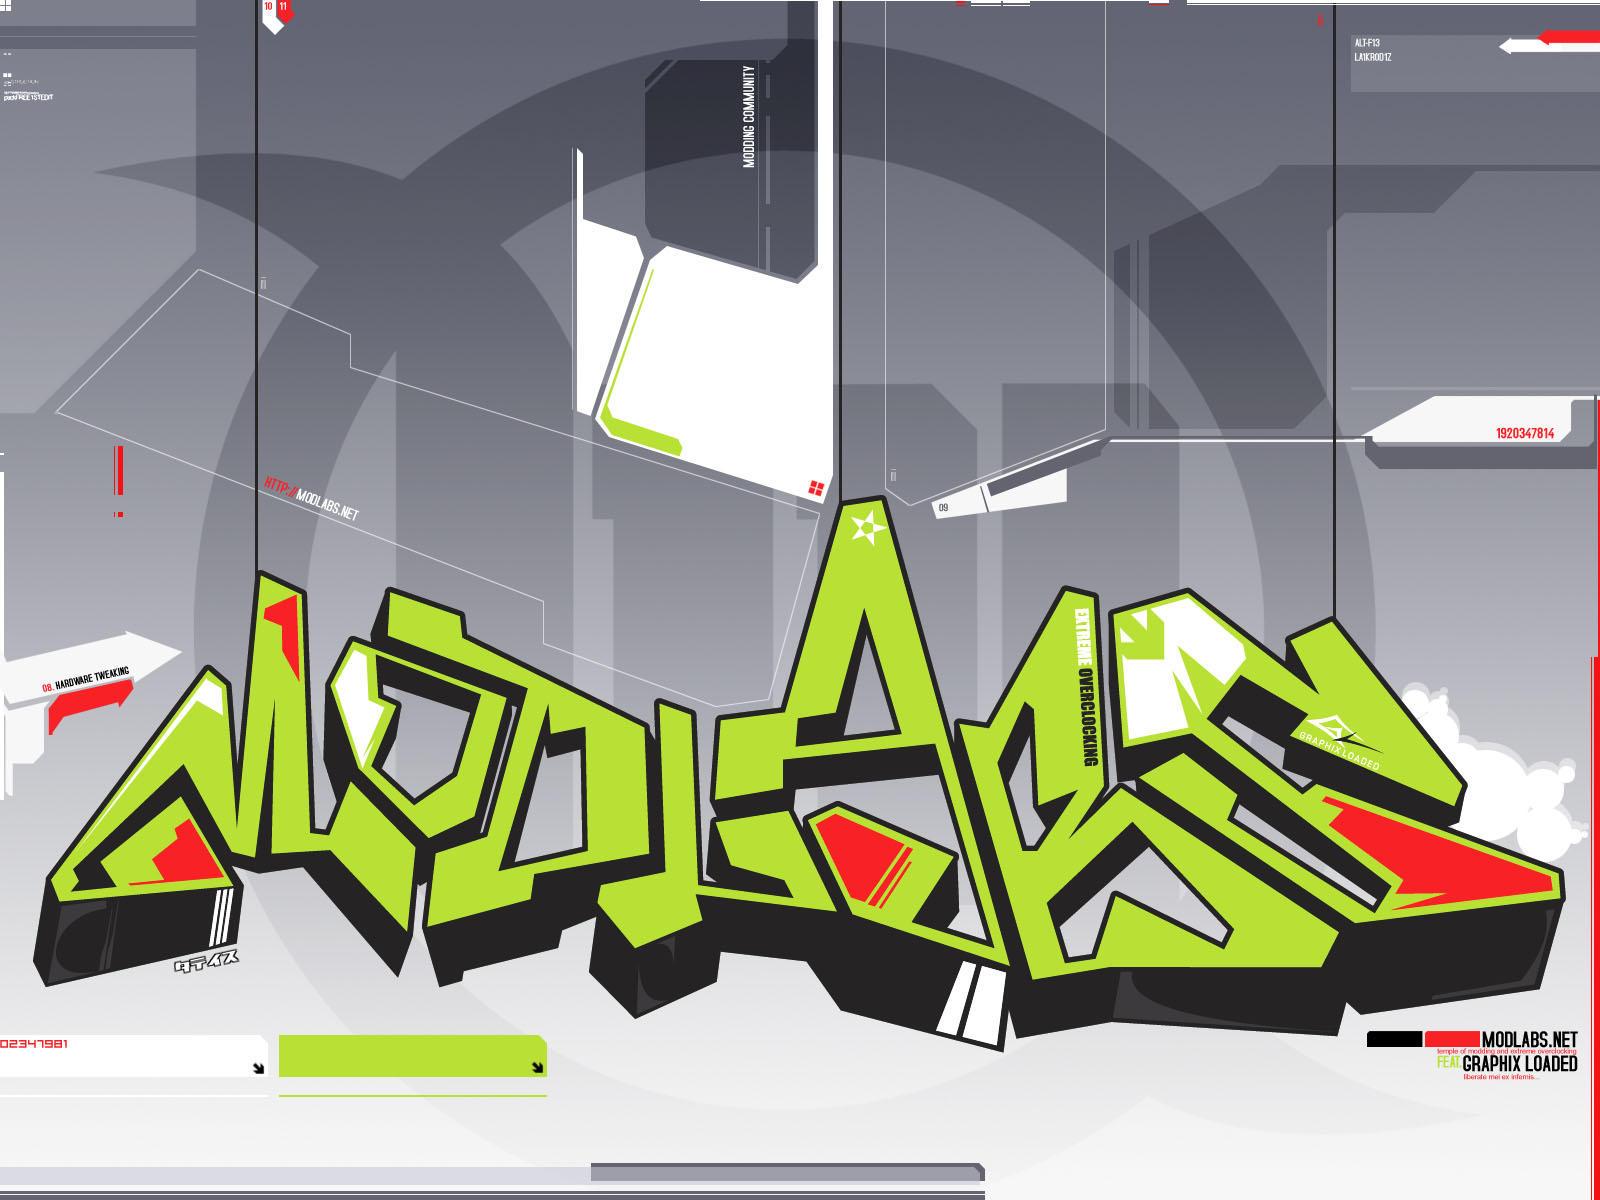 Modlabs wall II GRAFFITI by gloaded